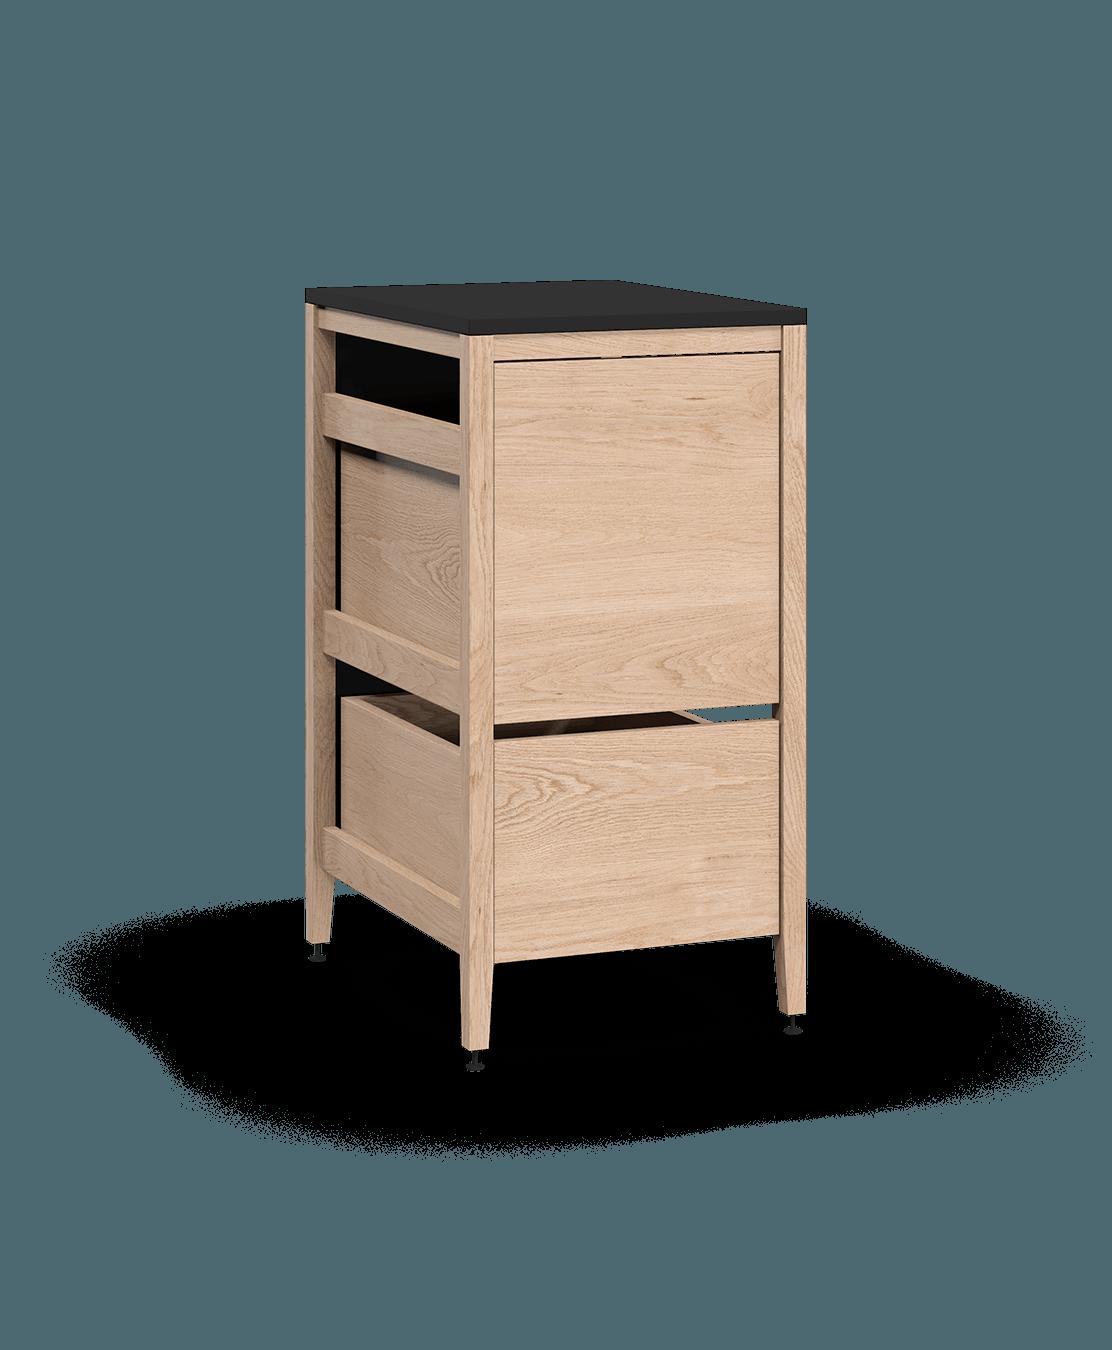 coquo radix white oak solid wood modular 1 drawer 2 bins trash base kitchen cabinet 18 inch C1-CTR-18TB-2002-NA